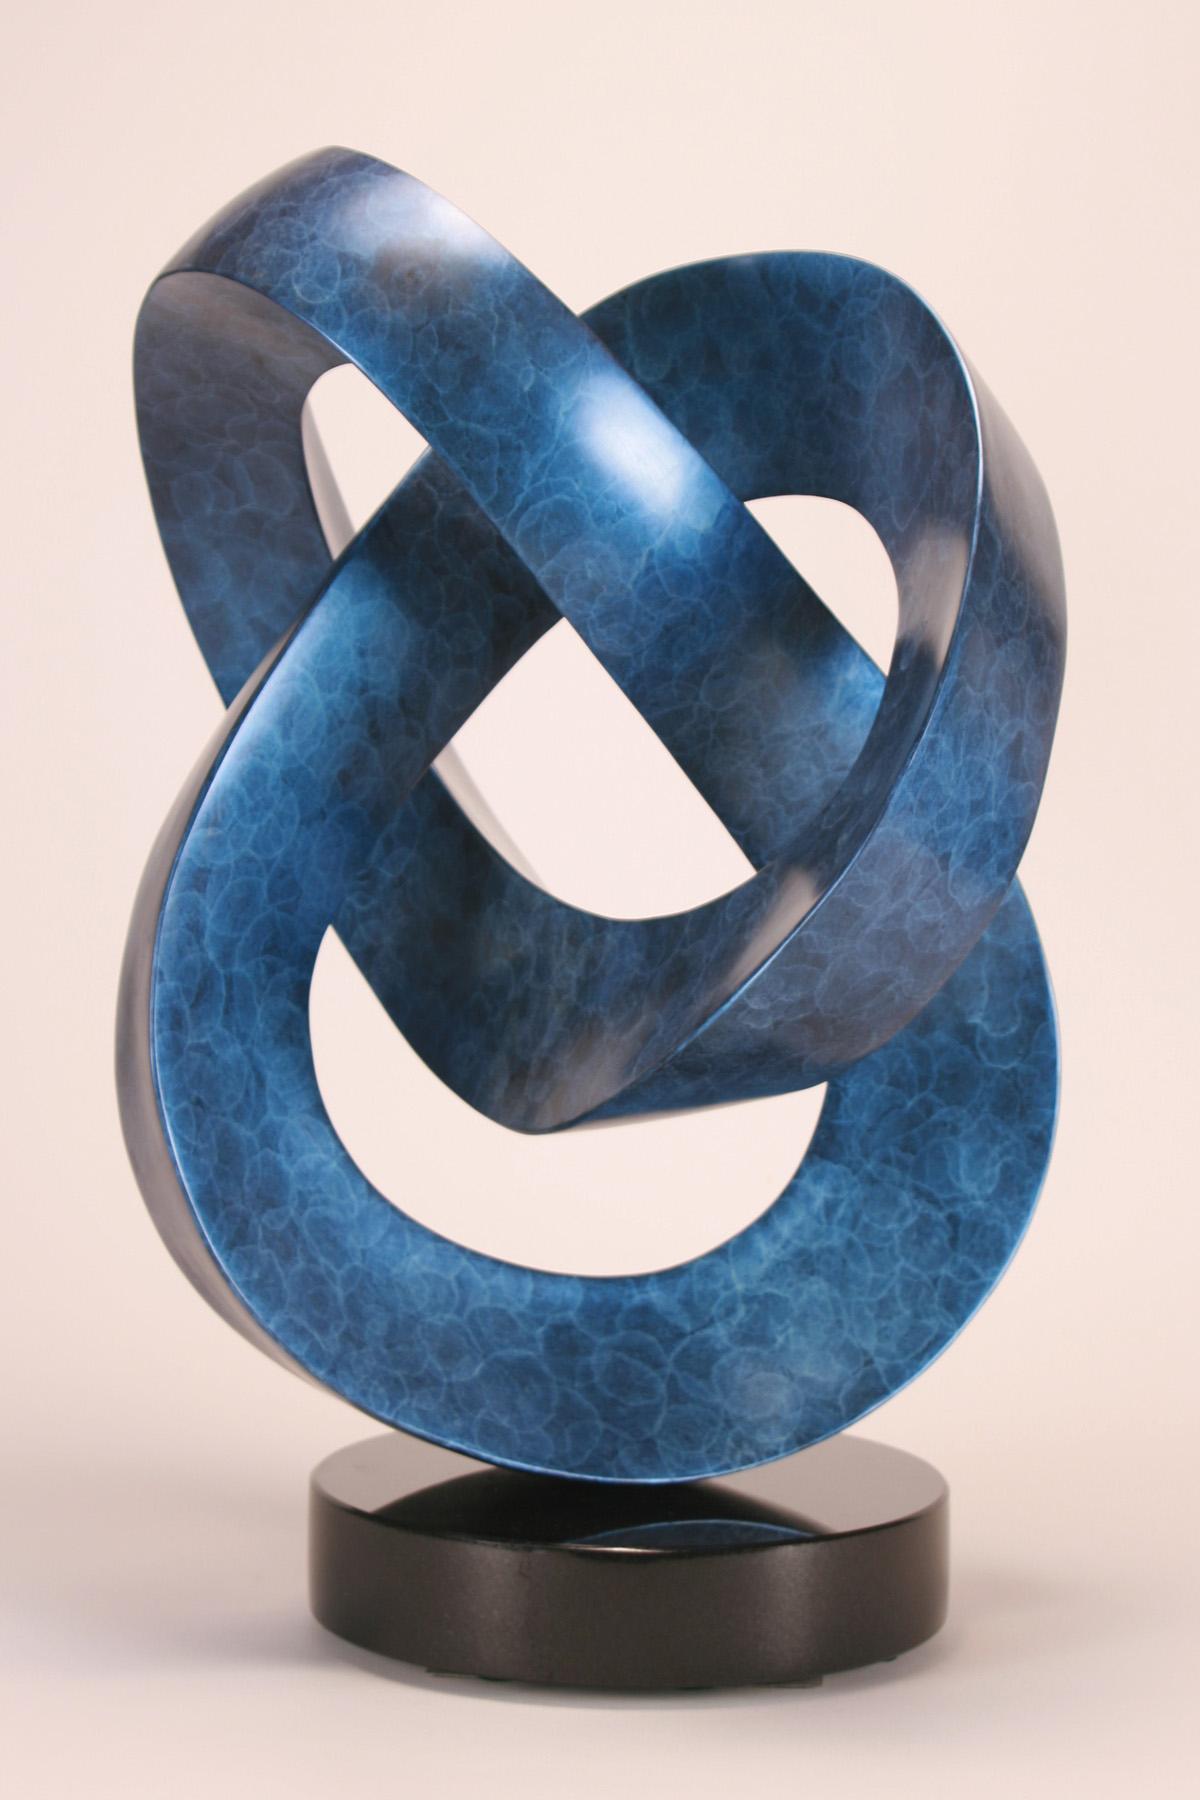 Circo, Bronze, 23 x 16 inches